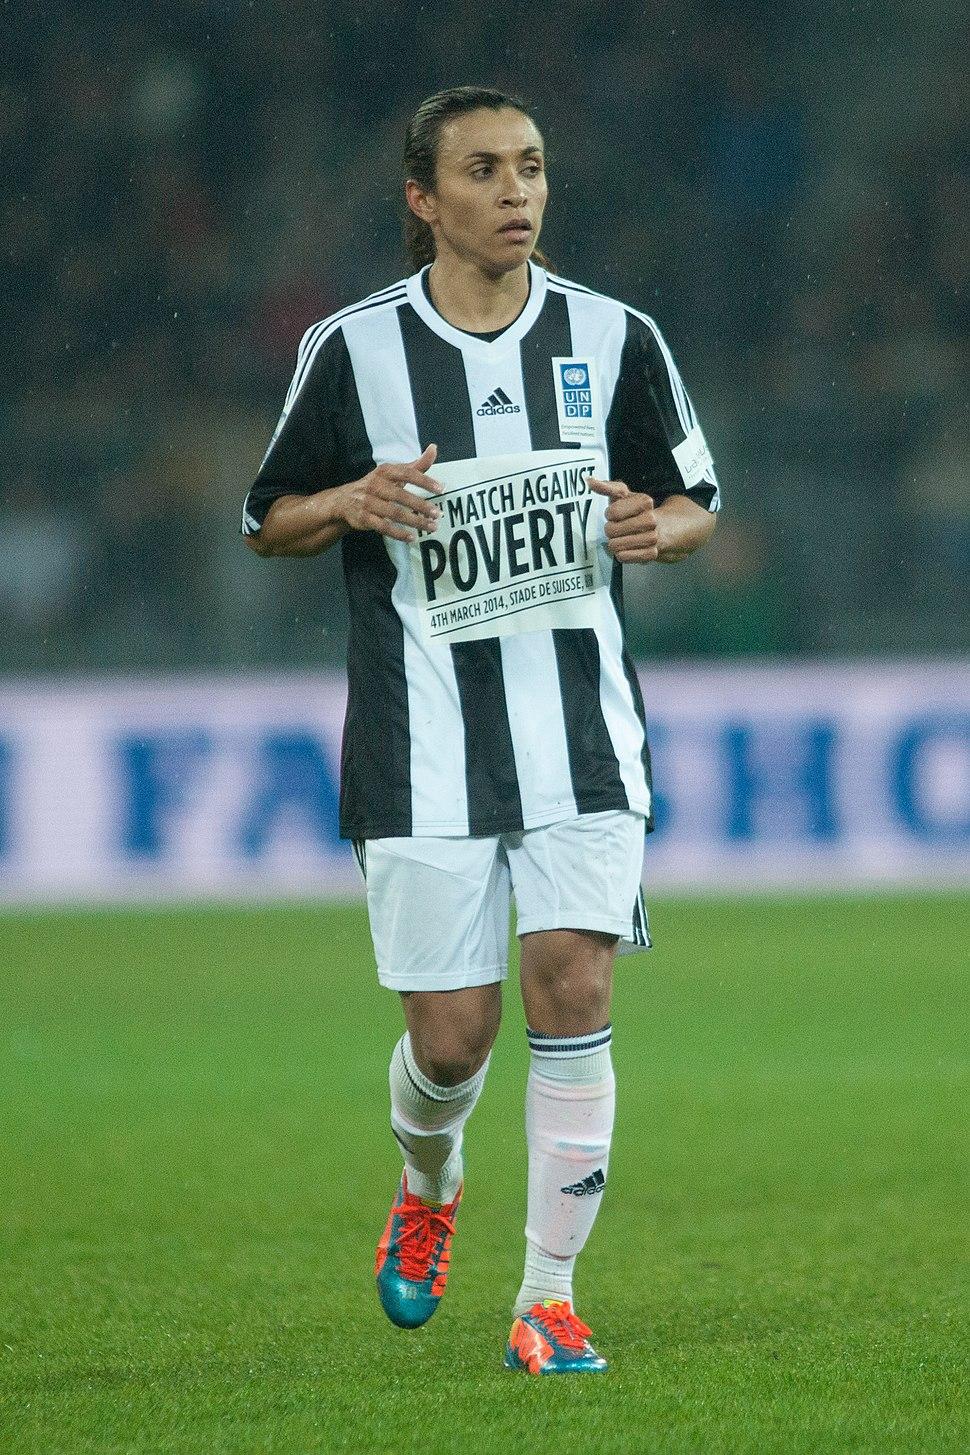 Football against poverty 2014 - Marta (2)